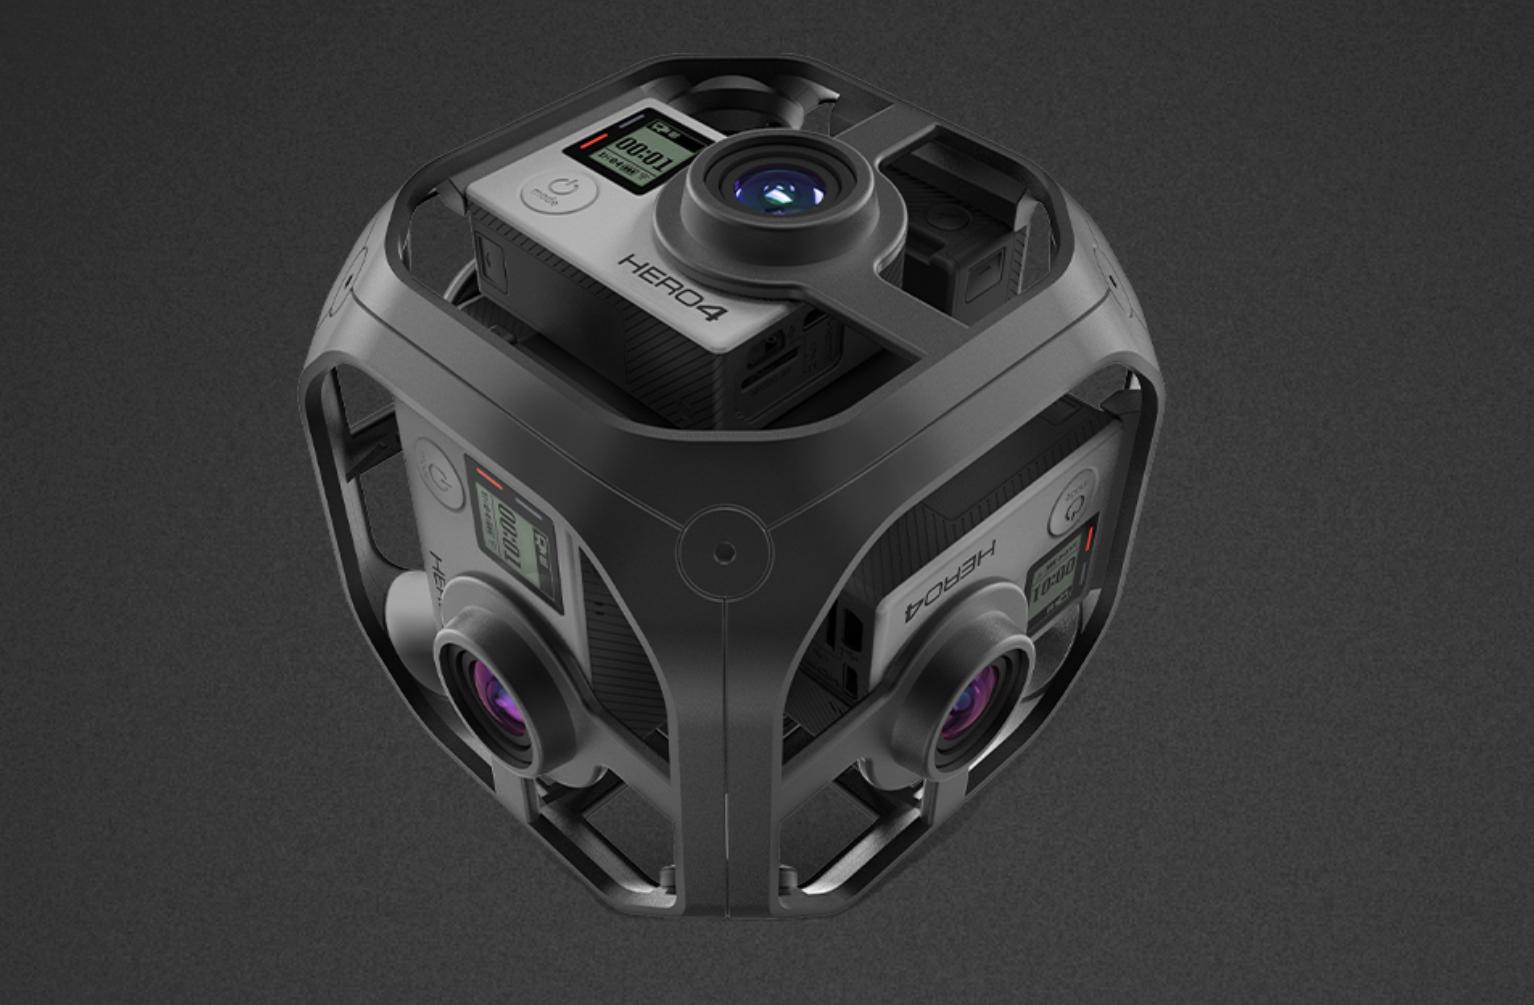 GoPro finally starts shipping its Omni 360-degree, spherical, VR